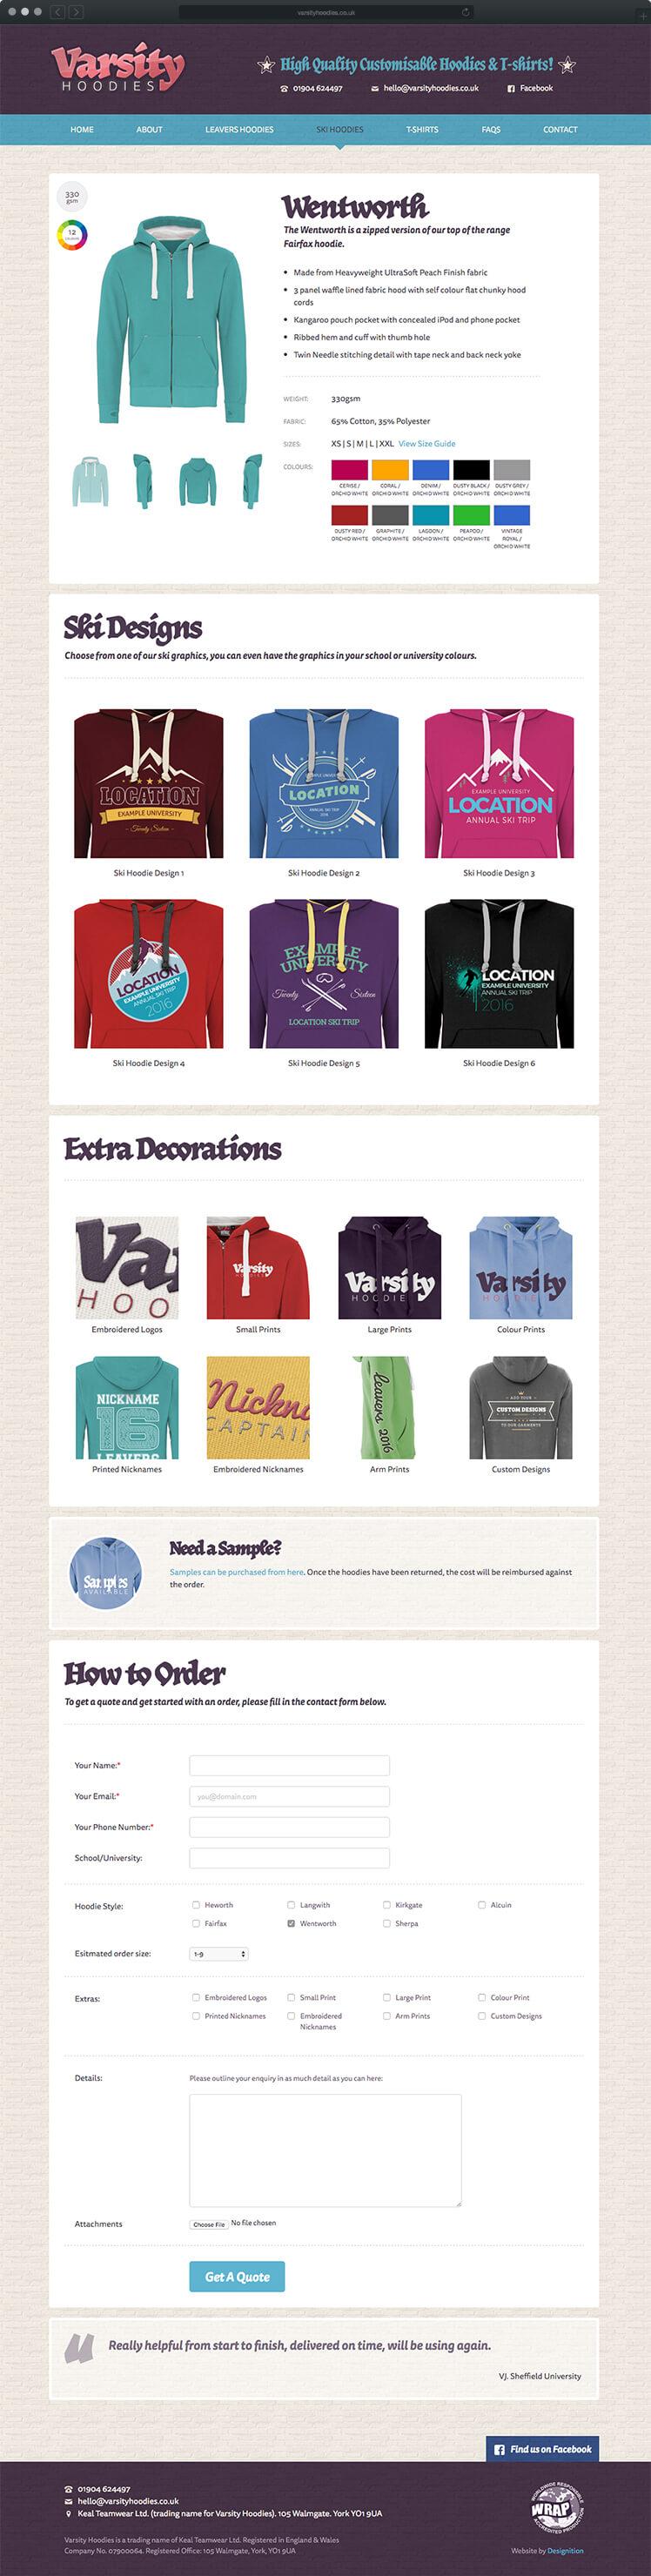 Varsity Hoodies - Website design